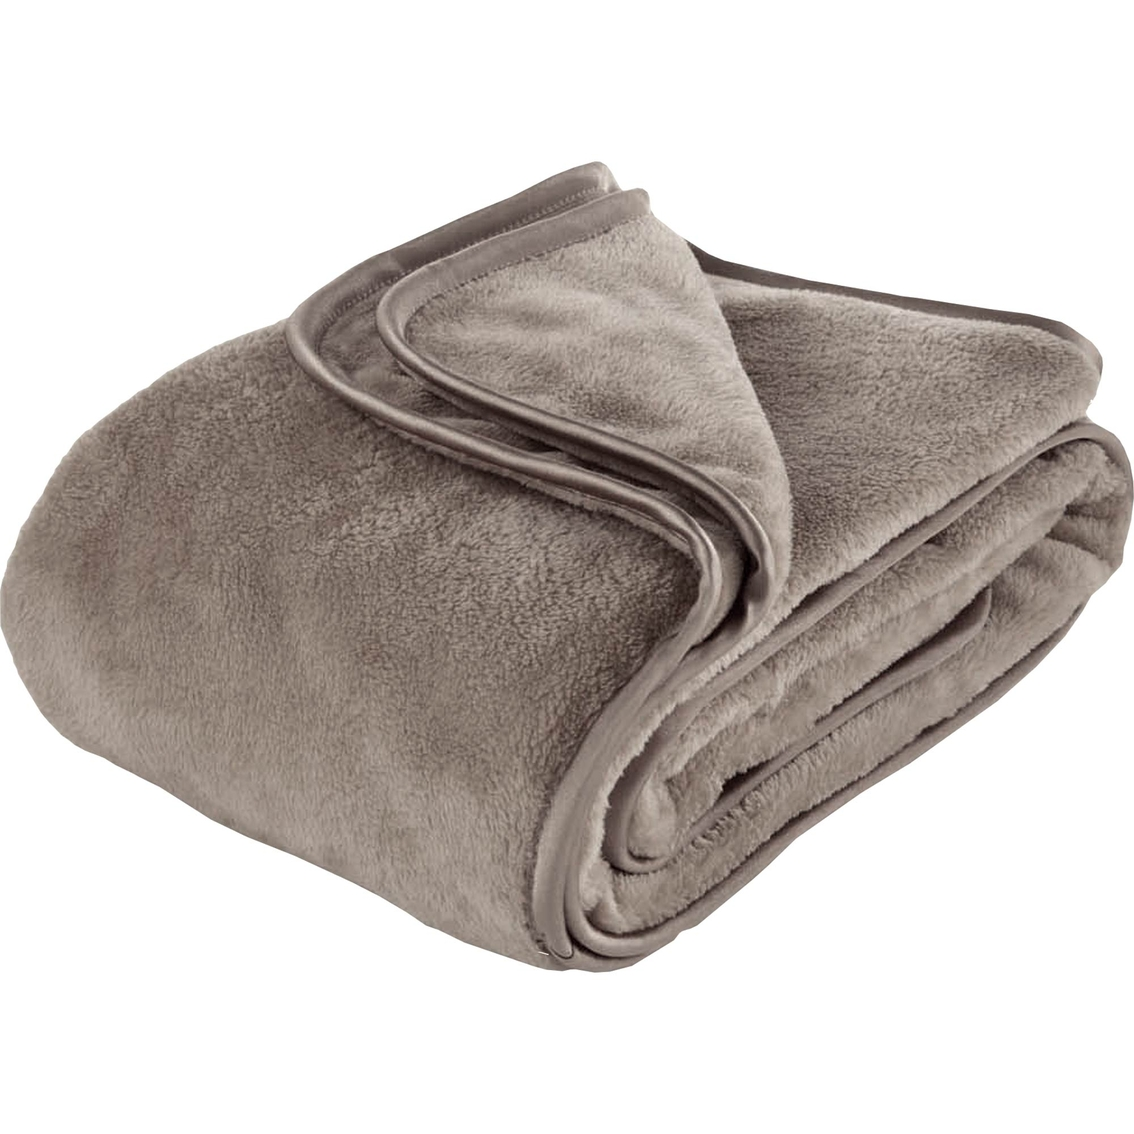 Brookstone Nap Bed Blanket  sc 1 st  ShopMyExchange.com & Brookstone Nap Bed Blanket | Blankets u0026 Throws | Home u0026 Appliances ...